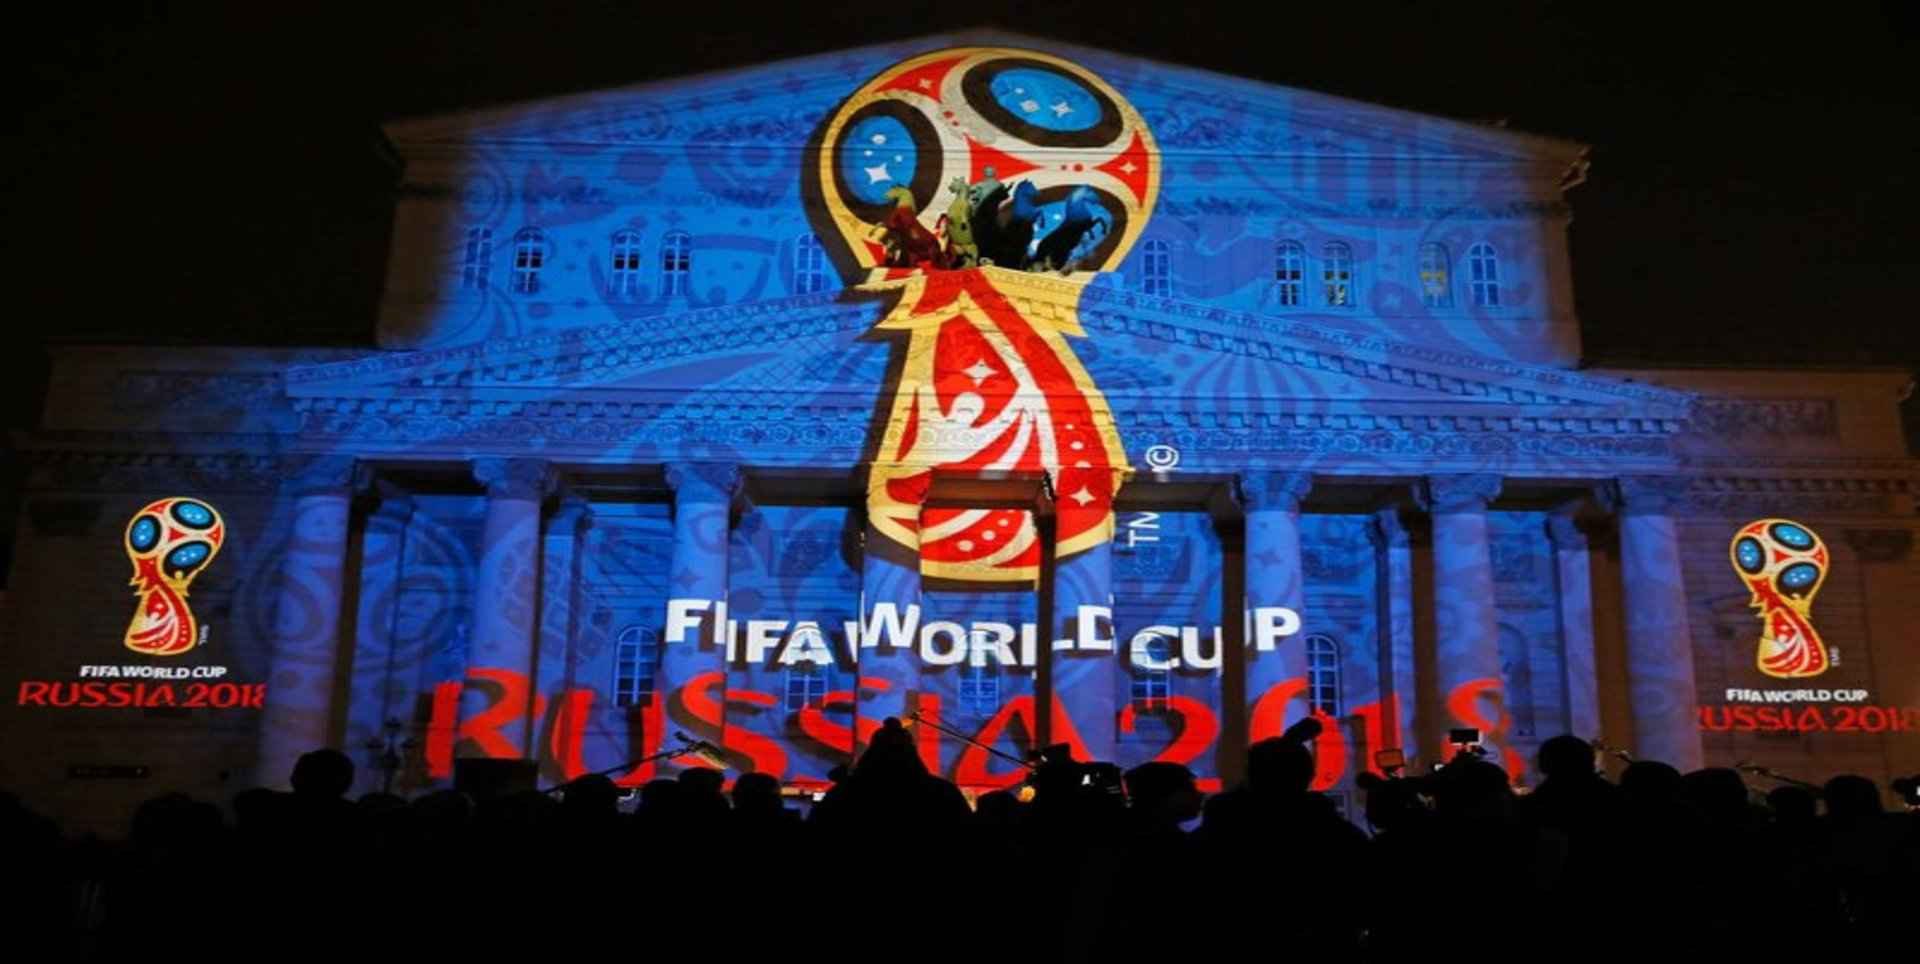 FIFA WC Israel V Spain Live